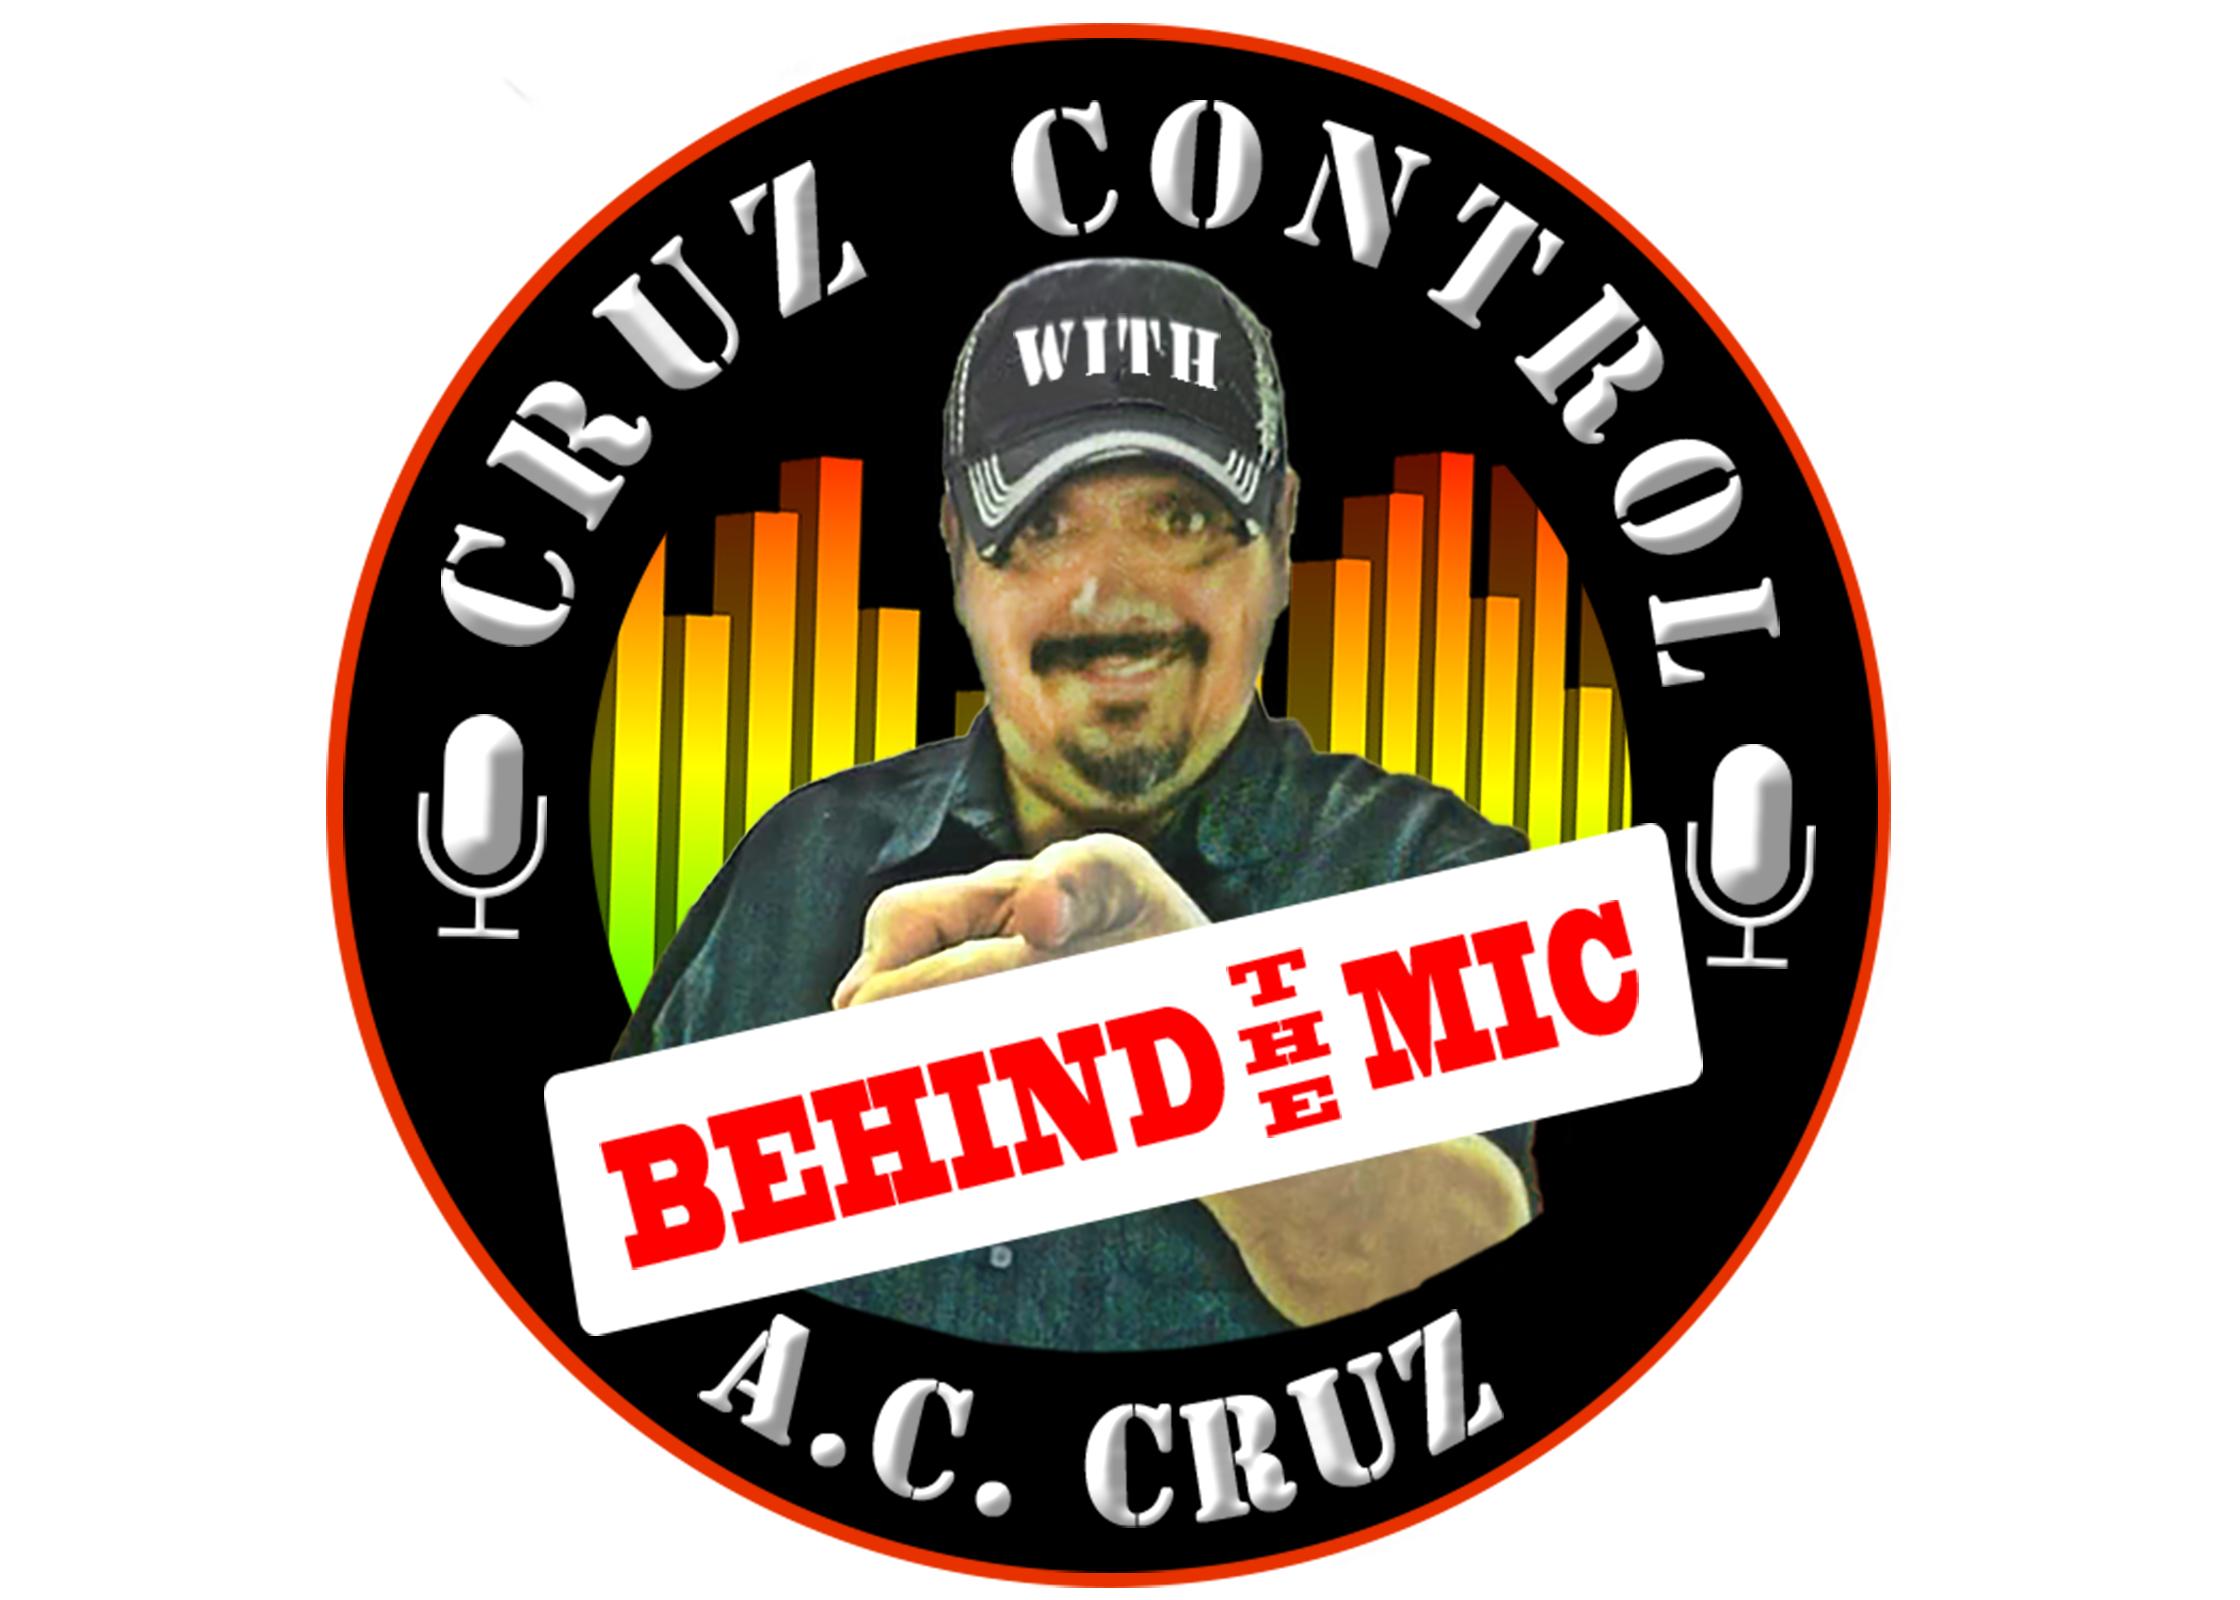 Cruz Control with AC Cruz Behind the Mic show art